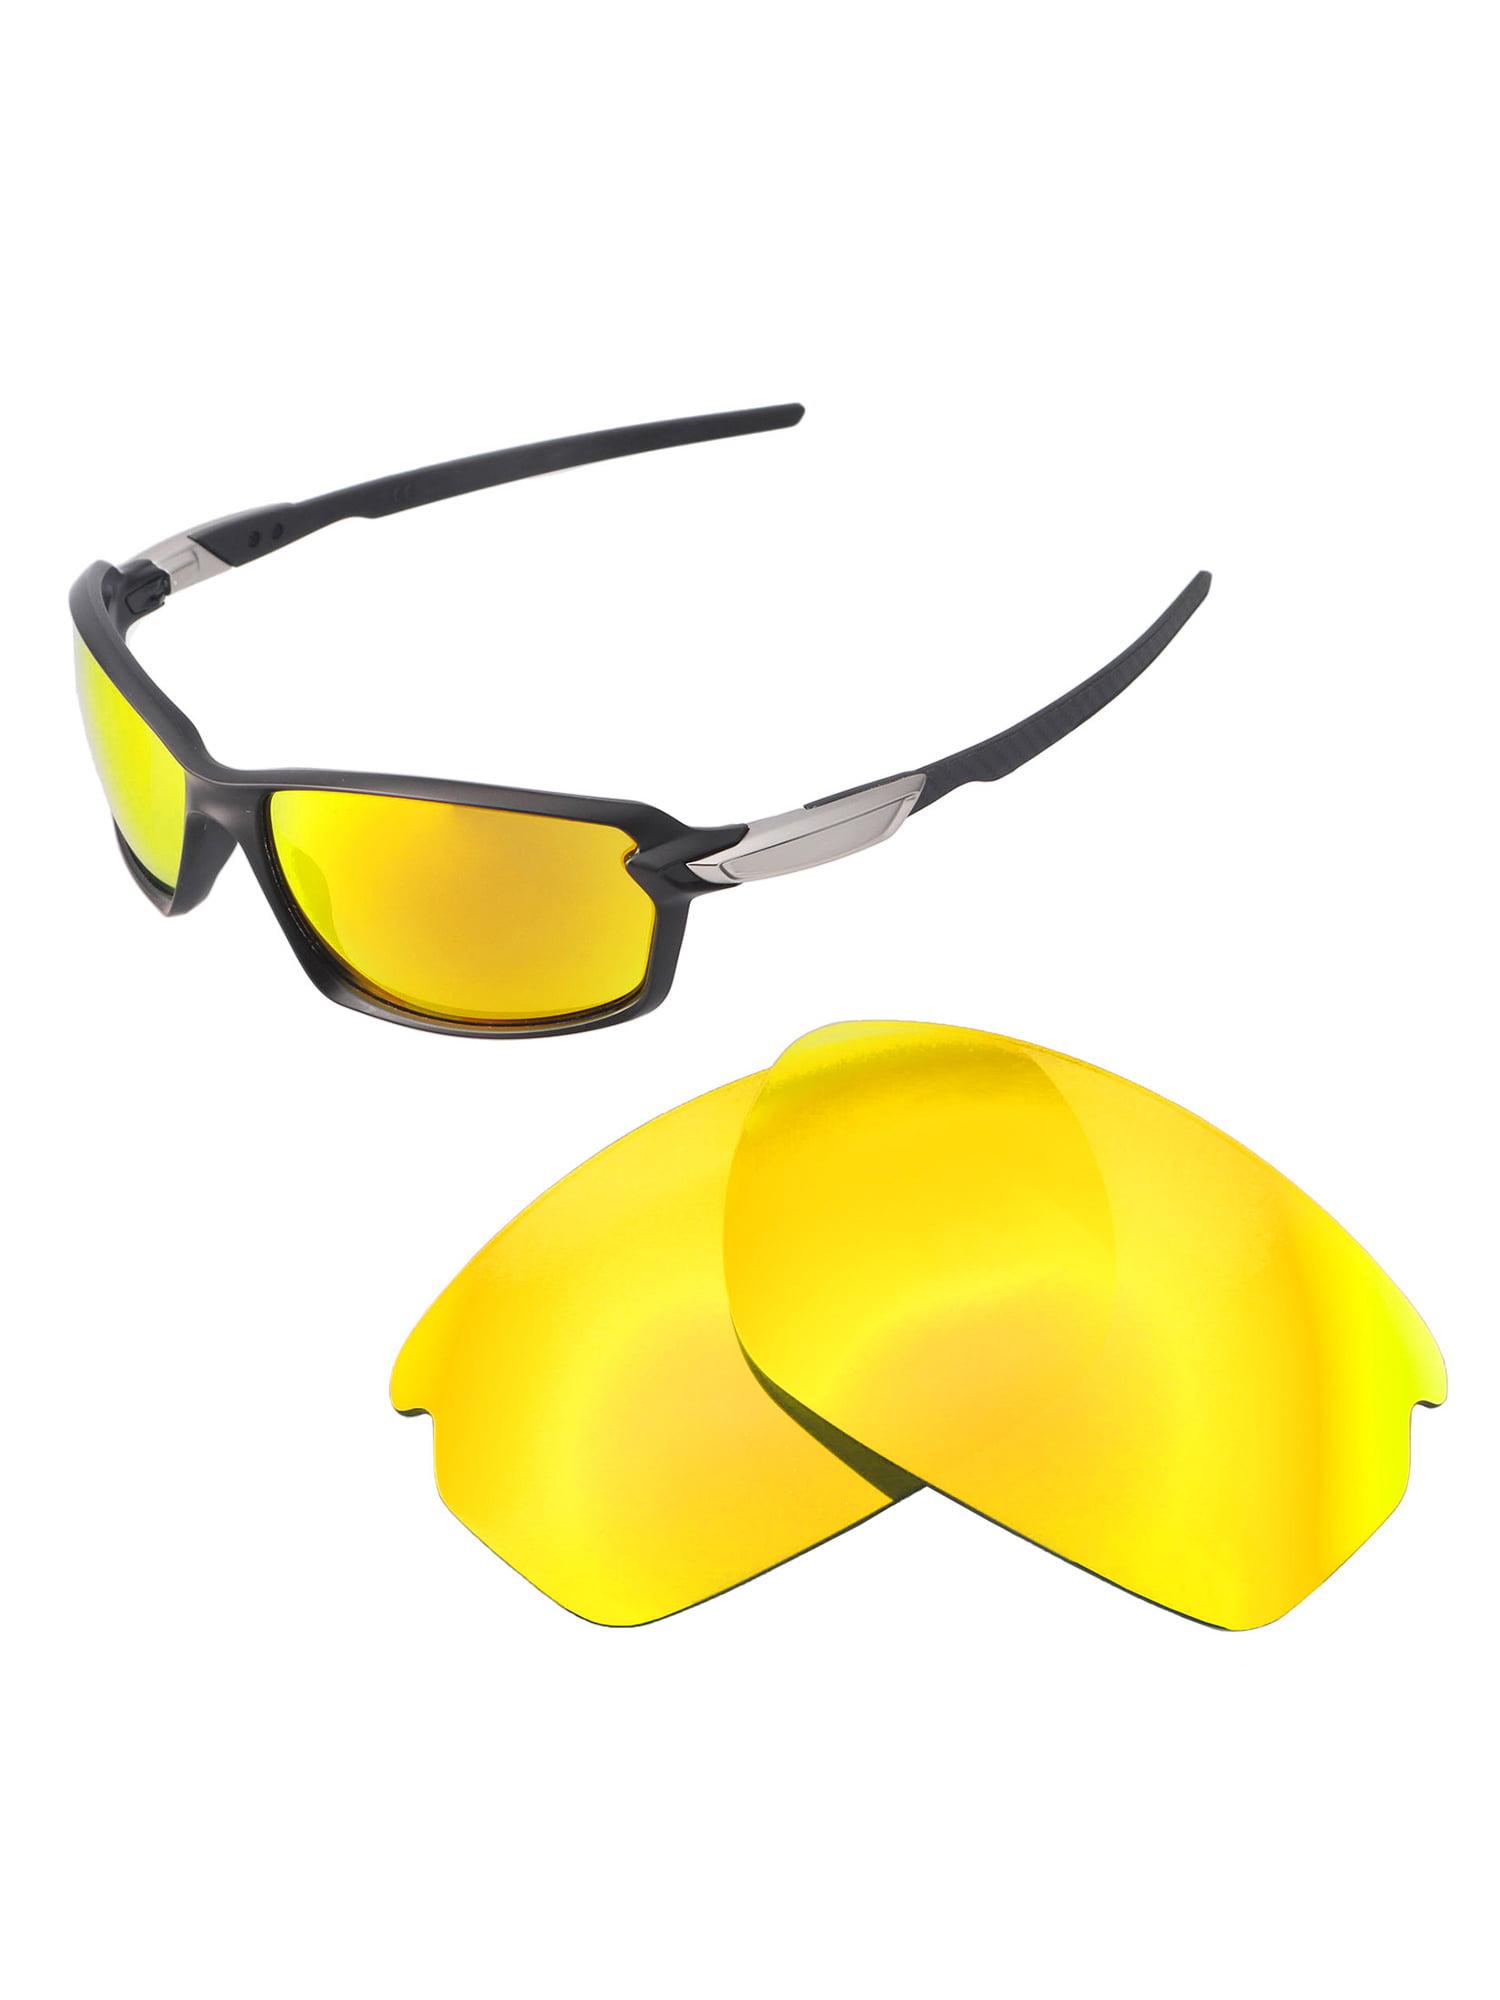 T Pink DG 131 New Womens DG Designer Sunglasses Free Pouch